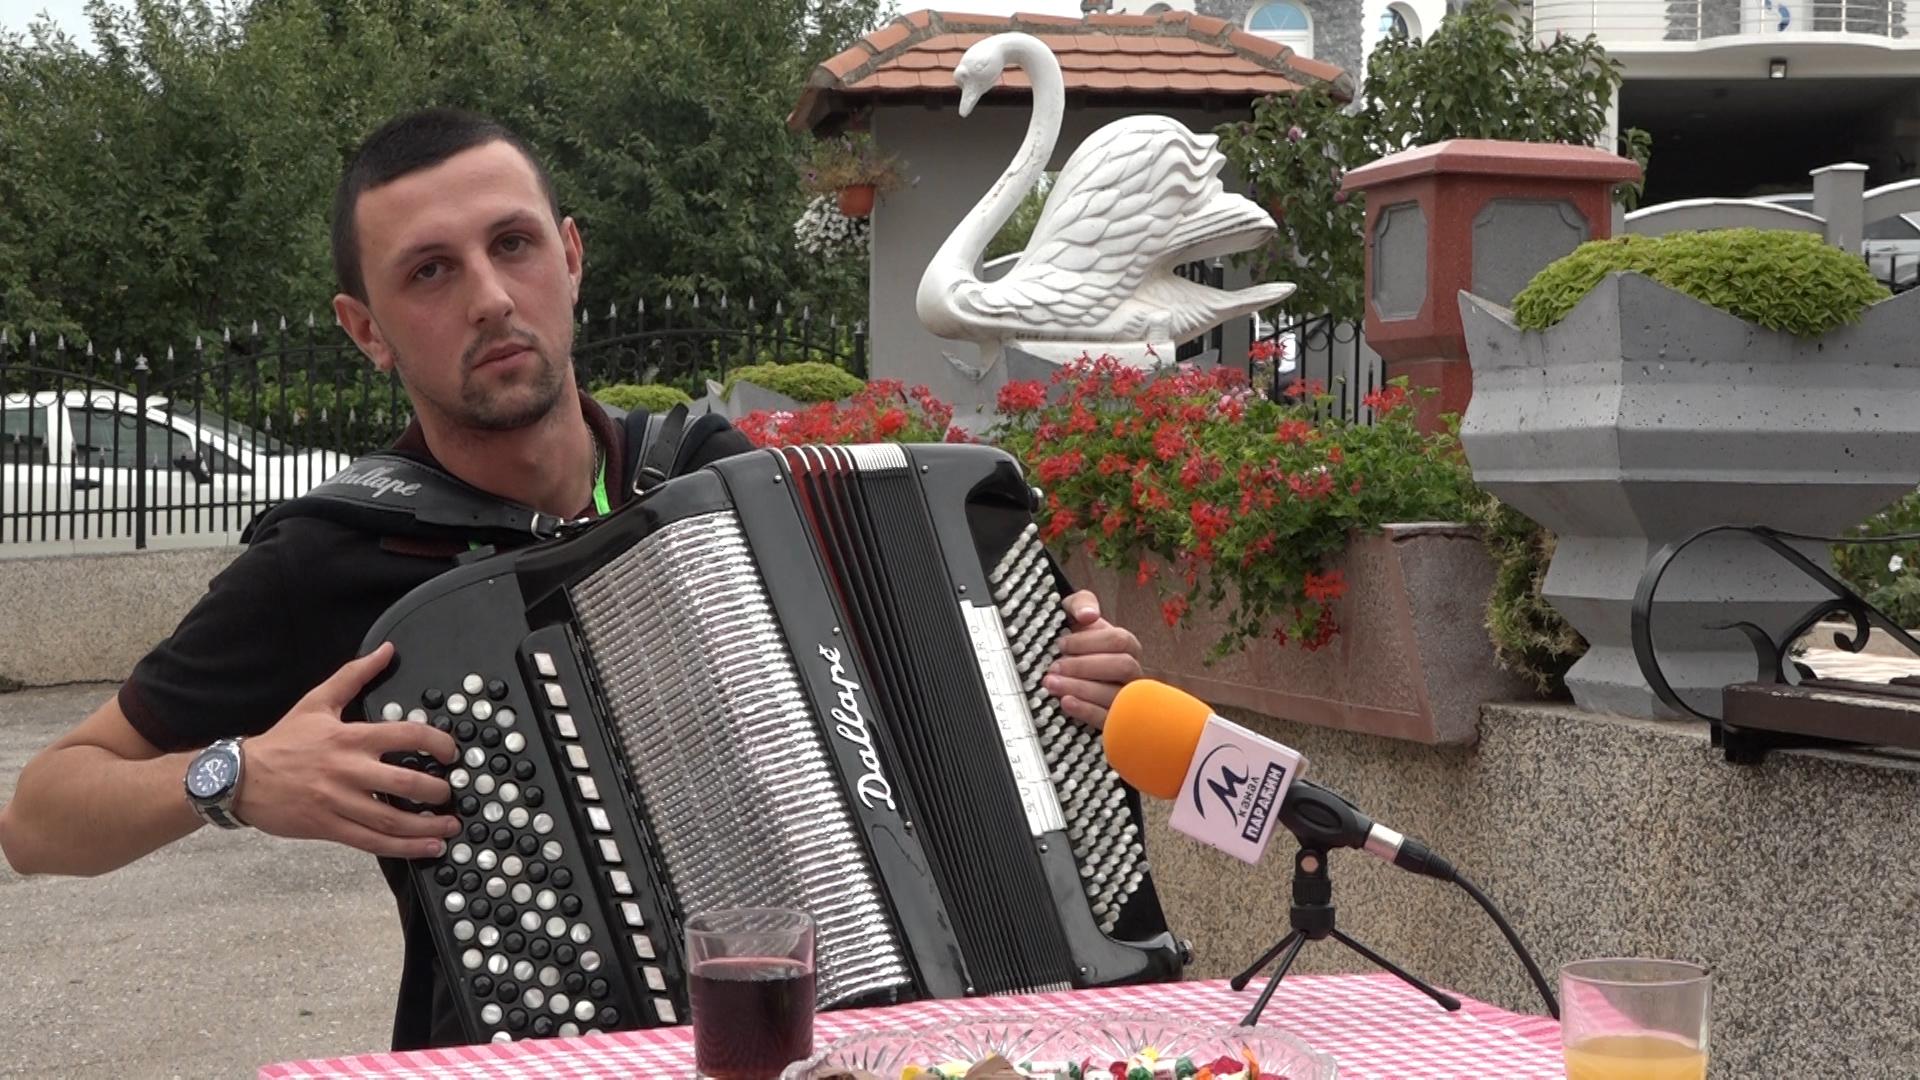 Harmonikaš iz Stubice Miloš Jovanović Bakin